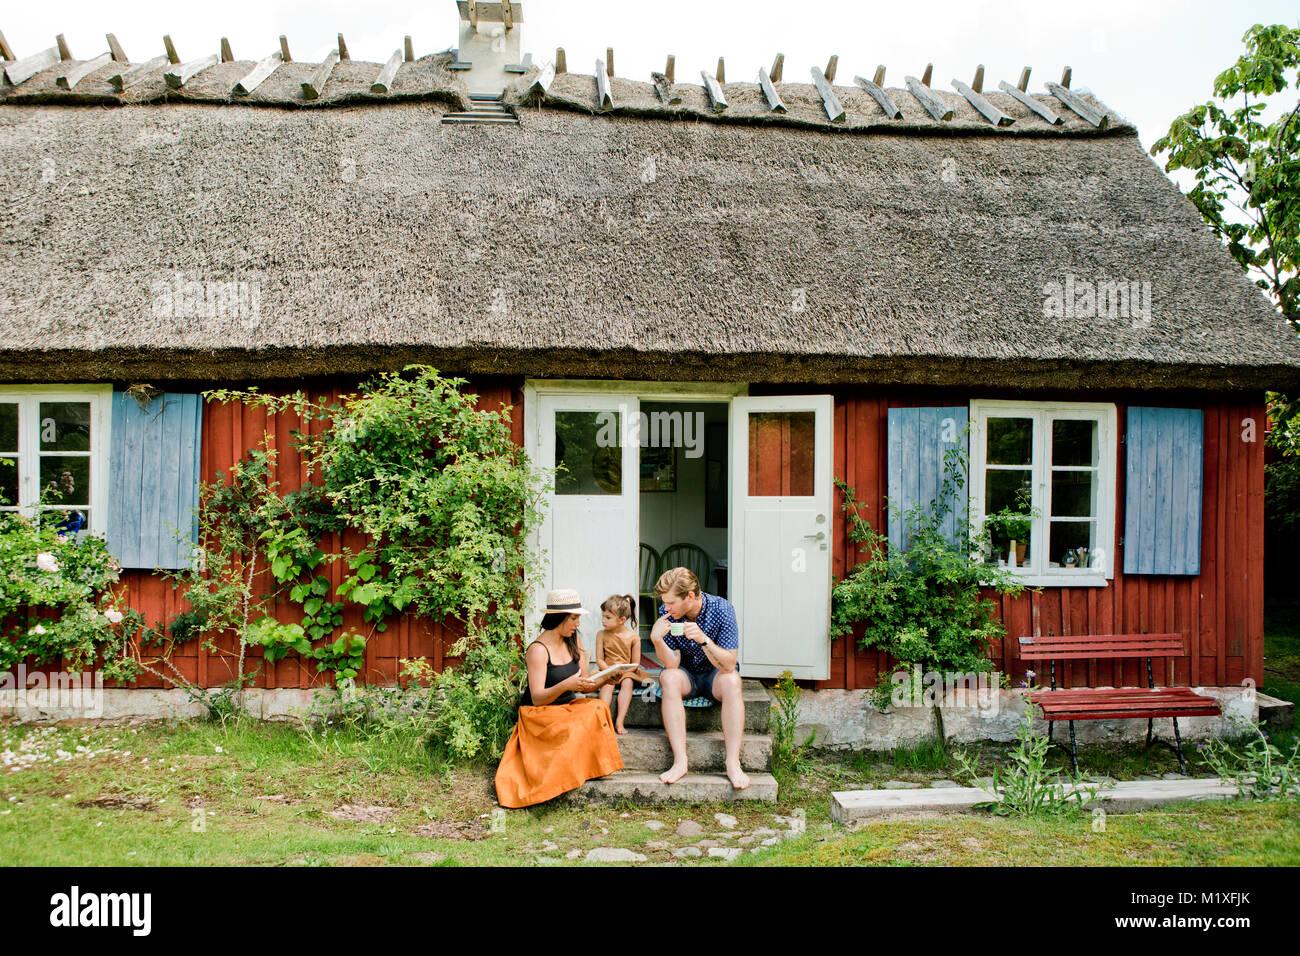 Family sitting on steps in Friseboda, Sweden - Stock Image